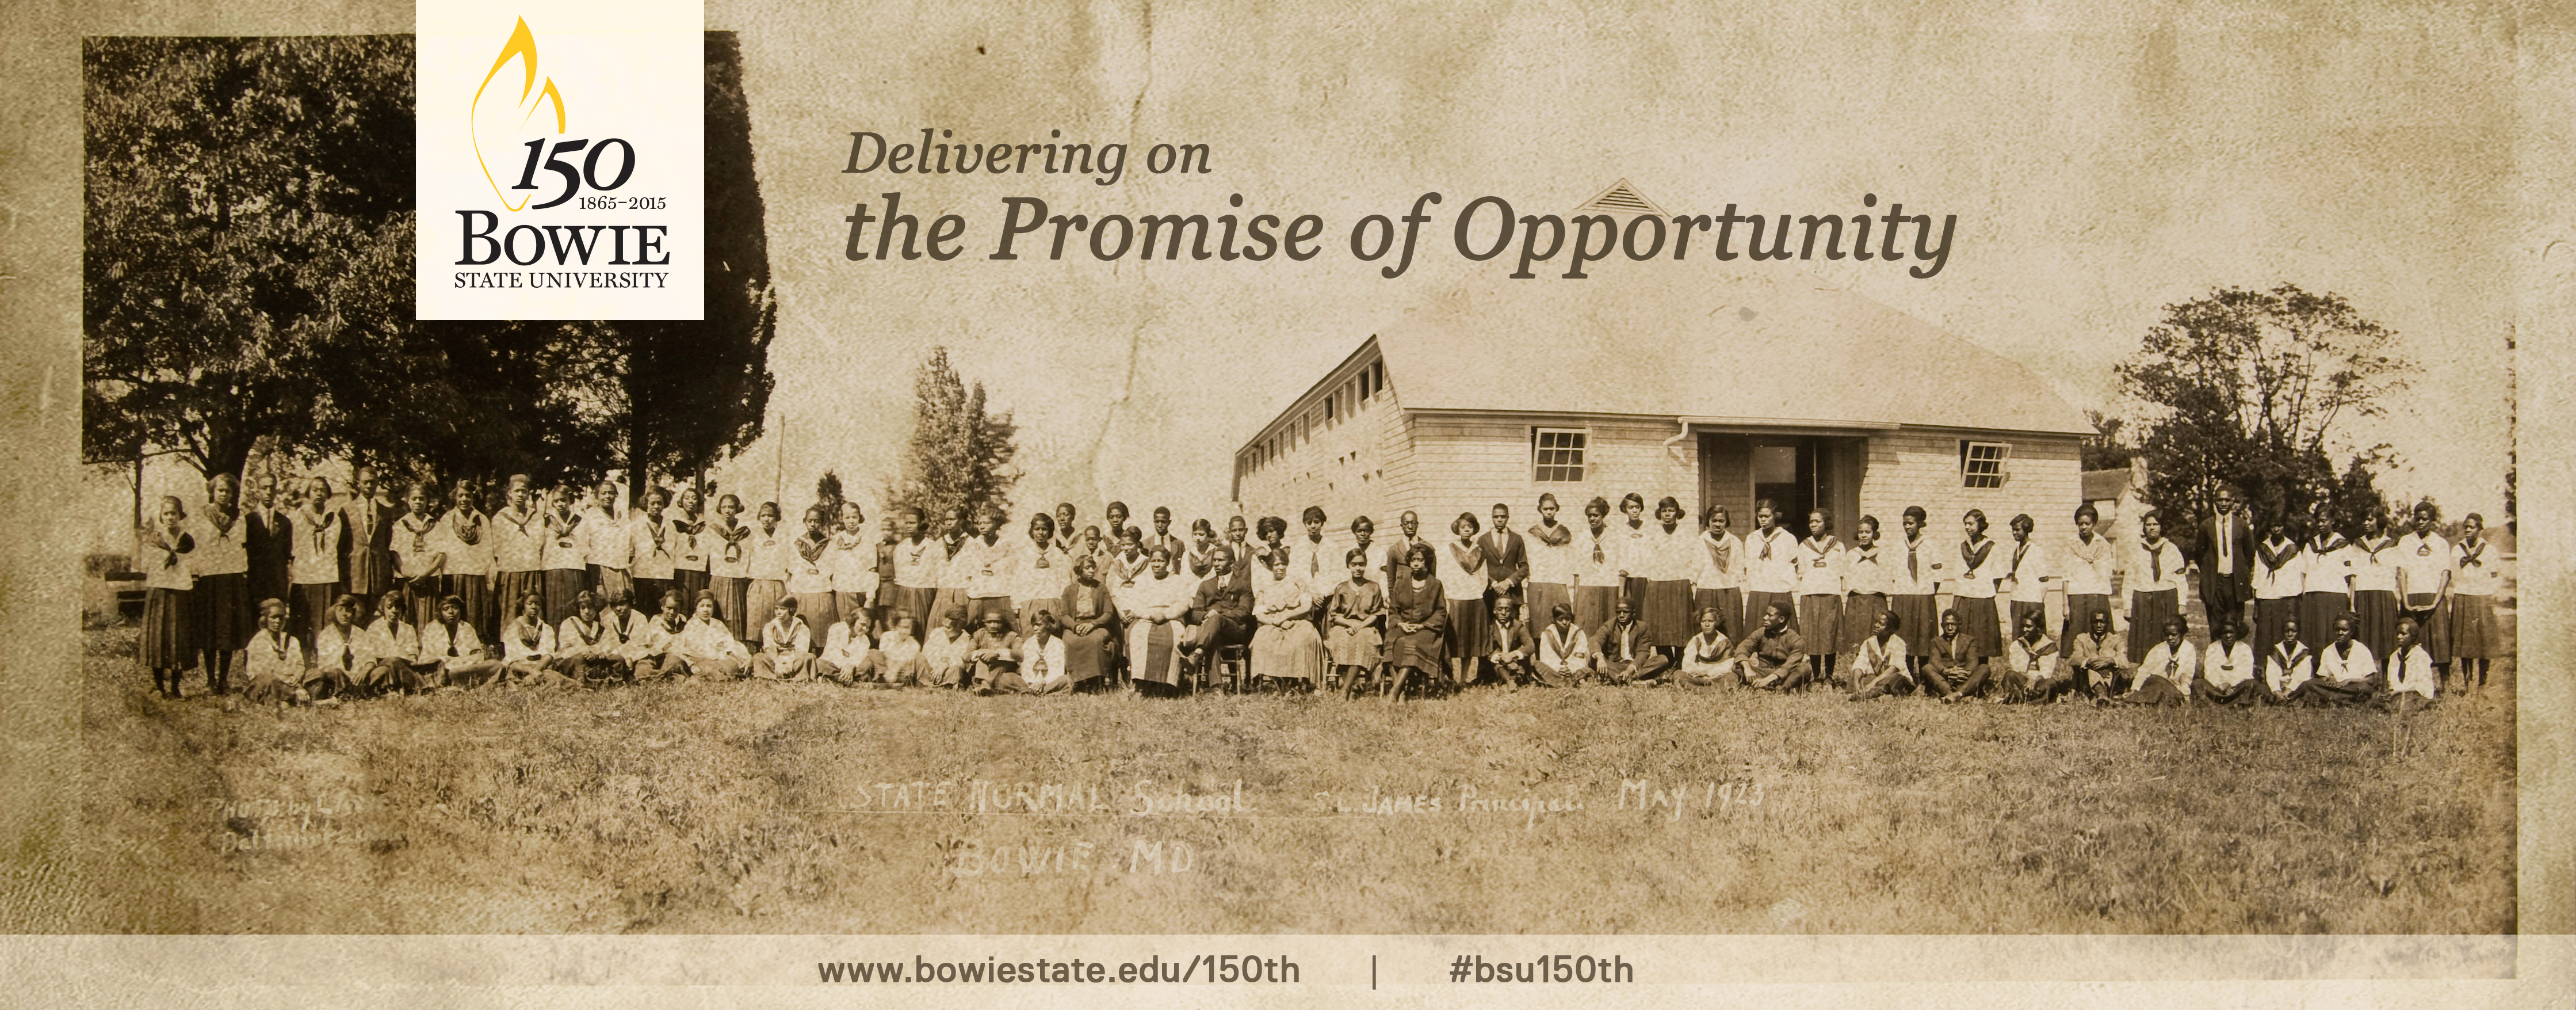 Timeline Bowie State University